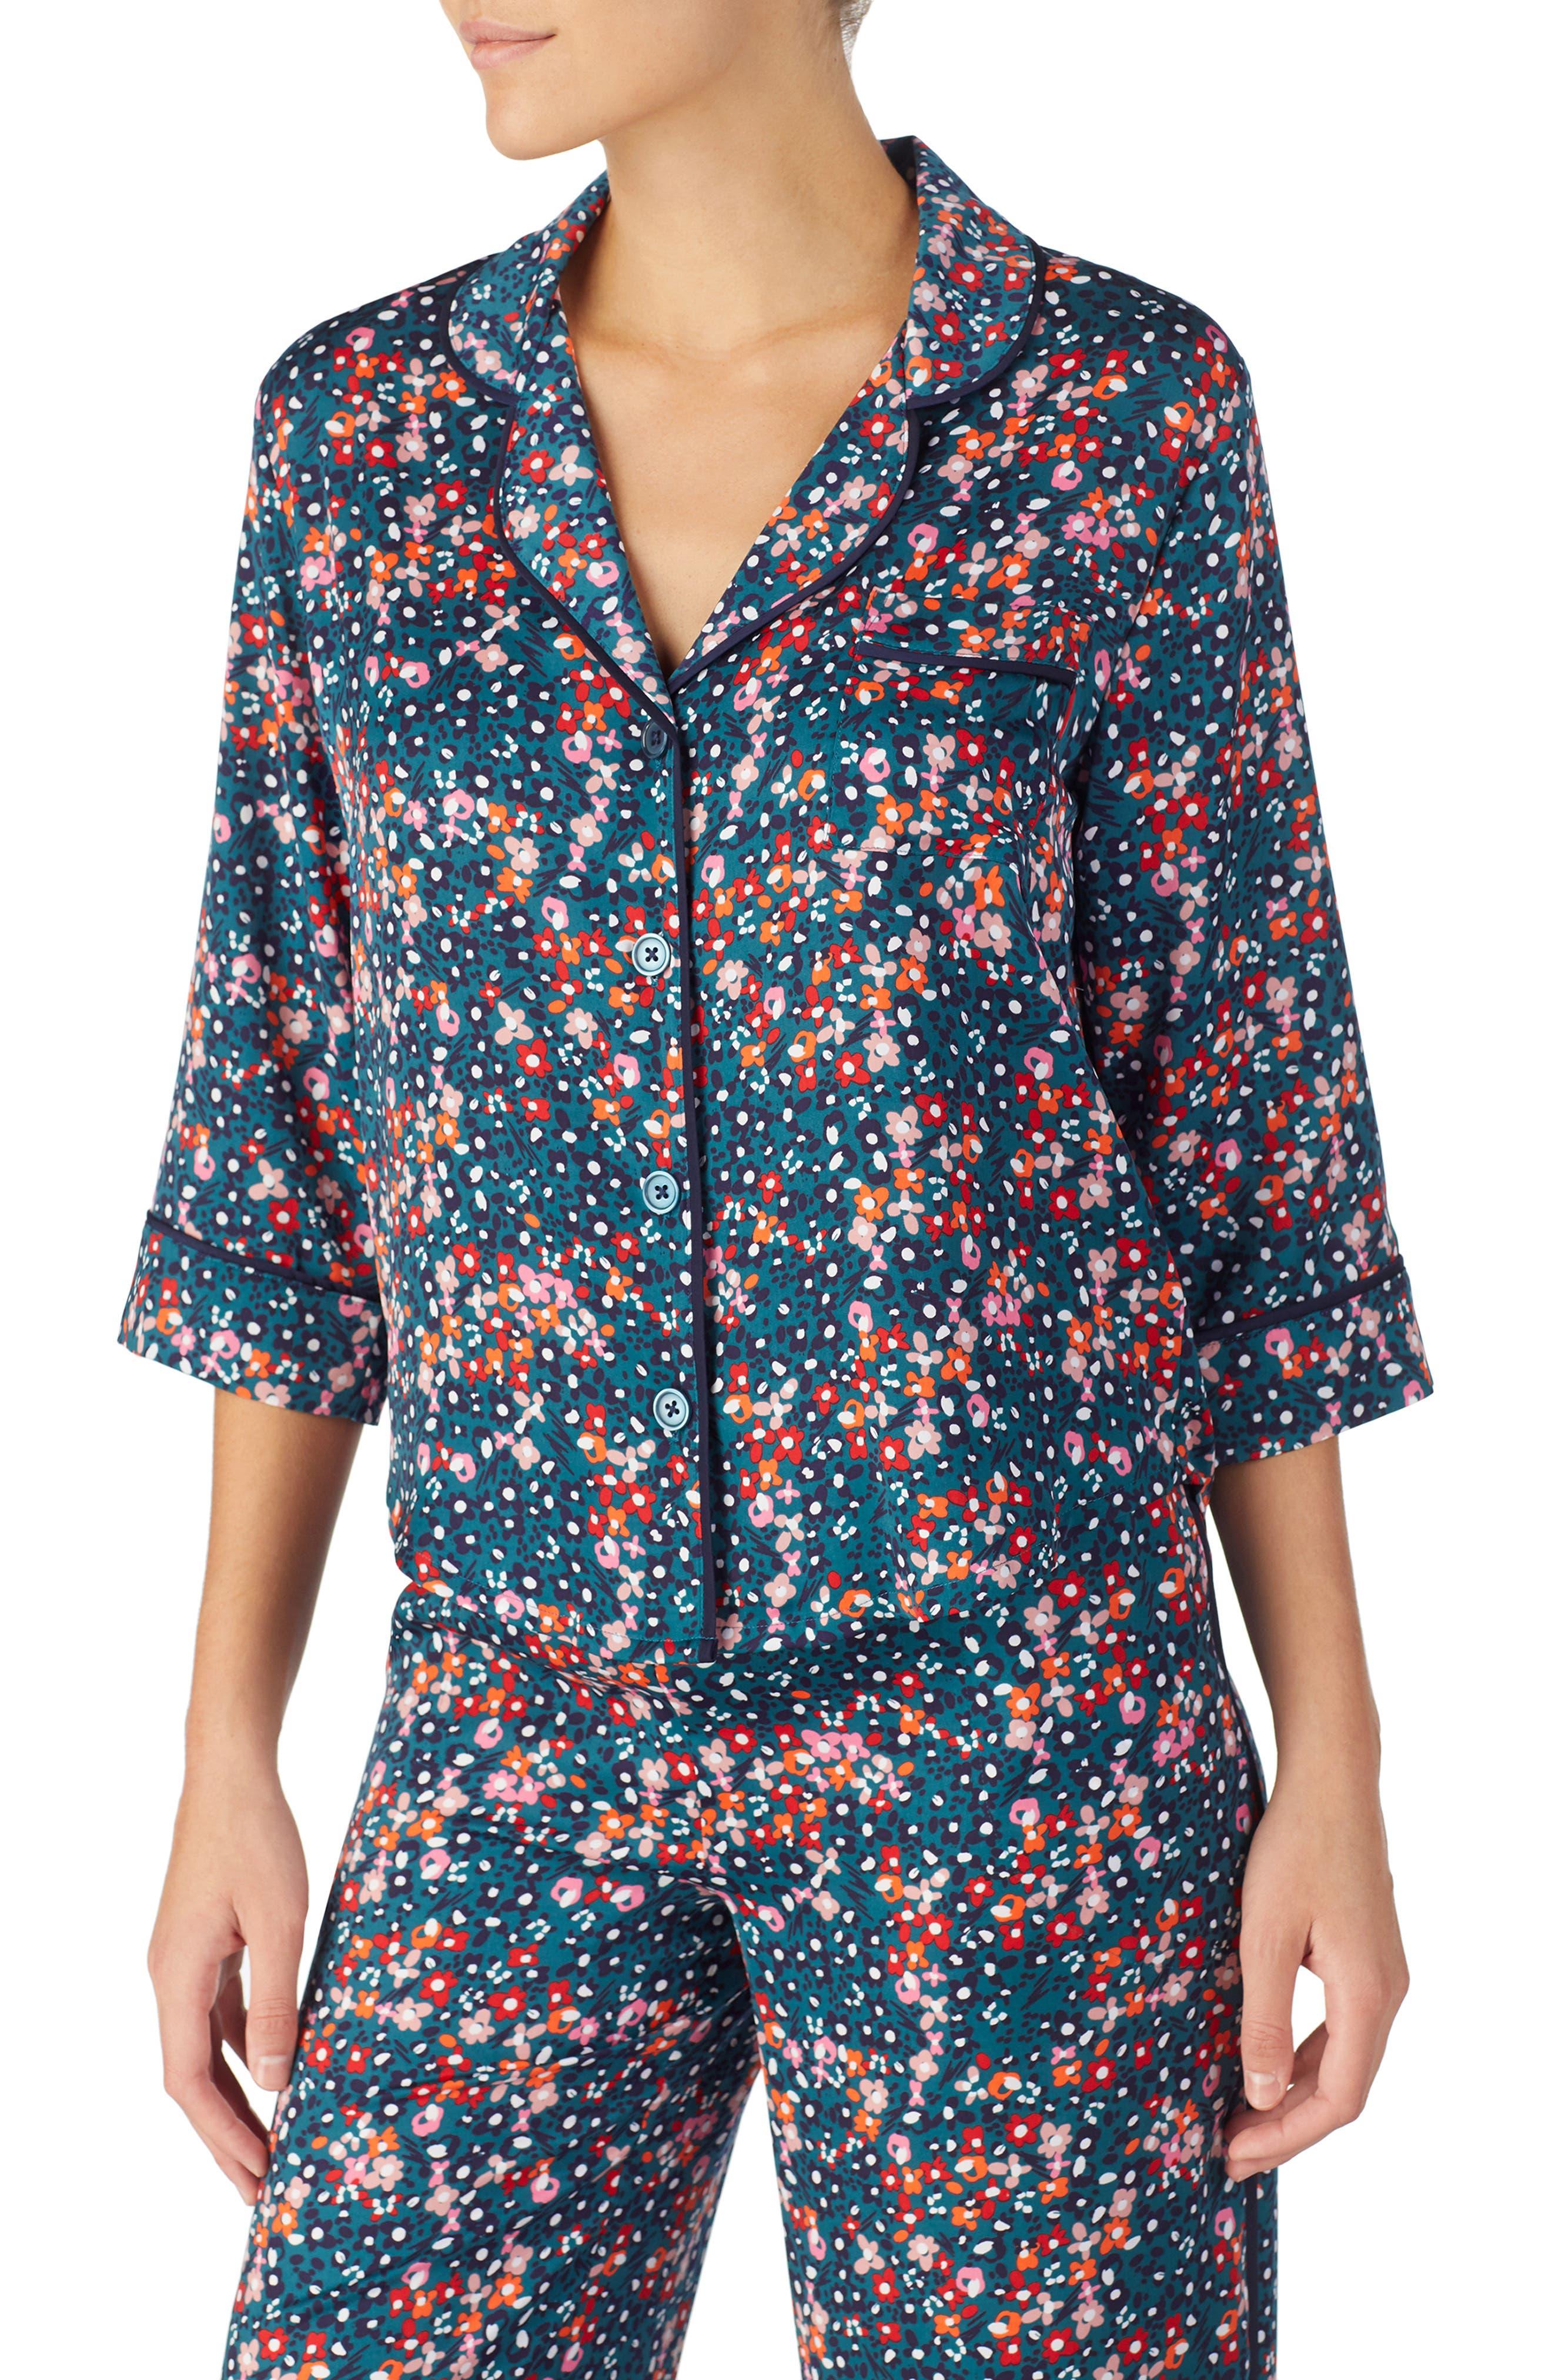 Pajama Top,                         Main,                         color, DITSY FLORAL